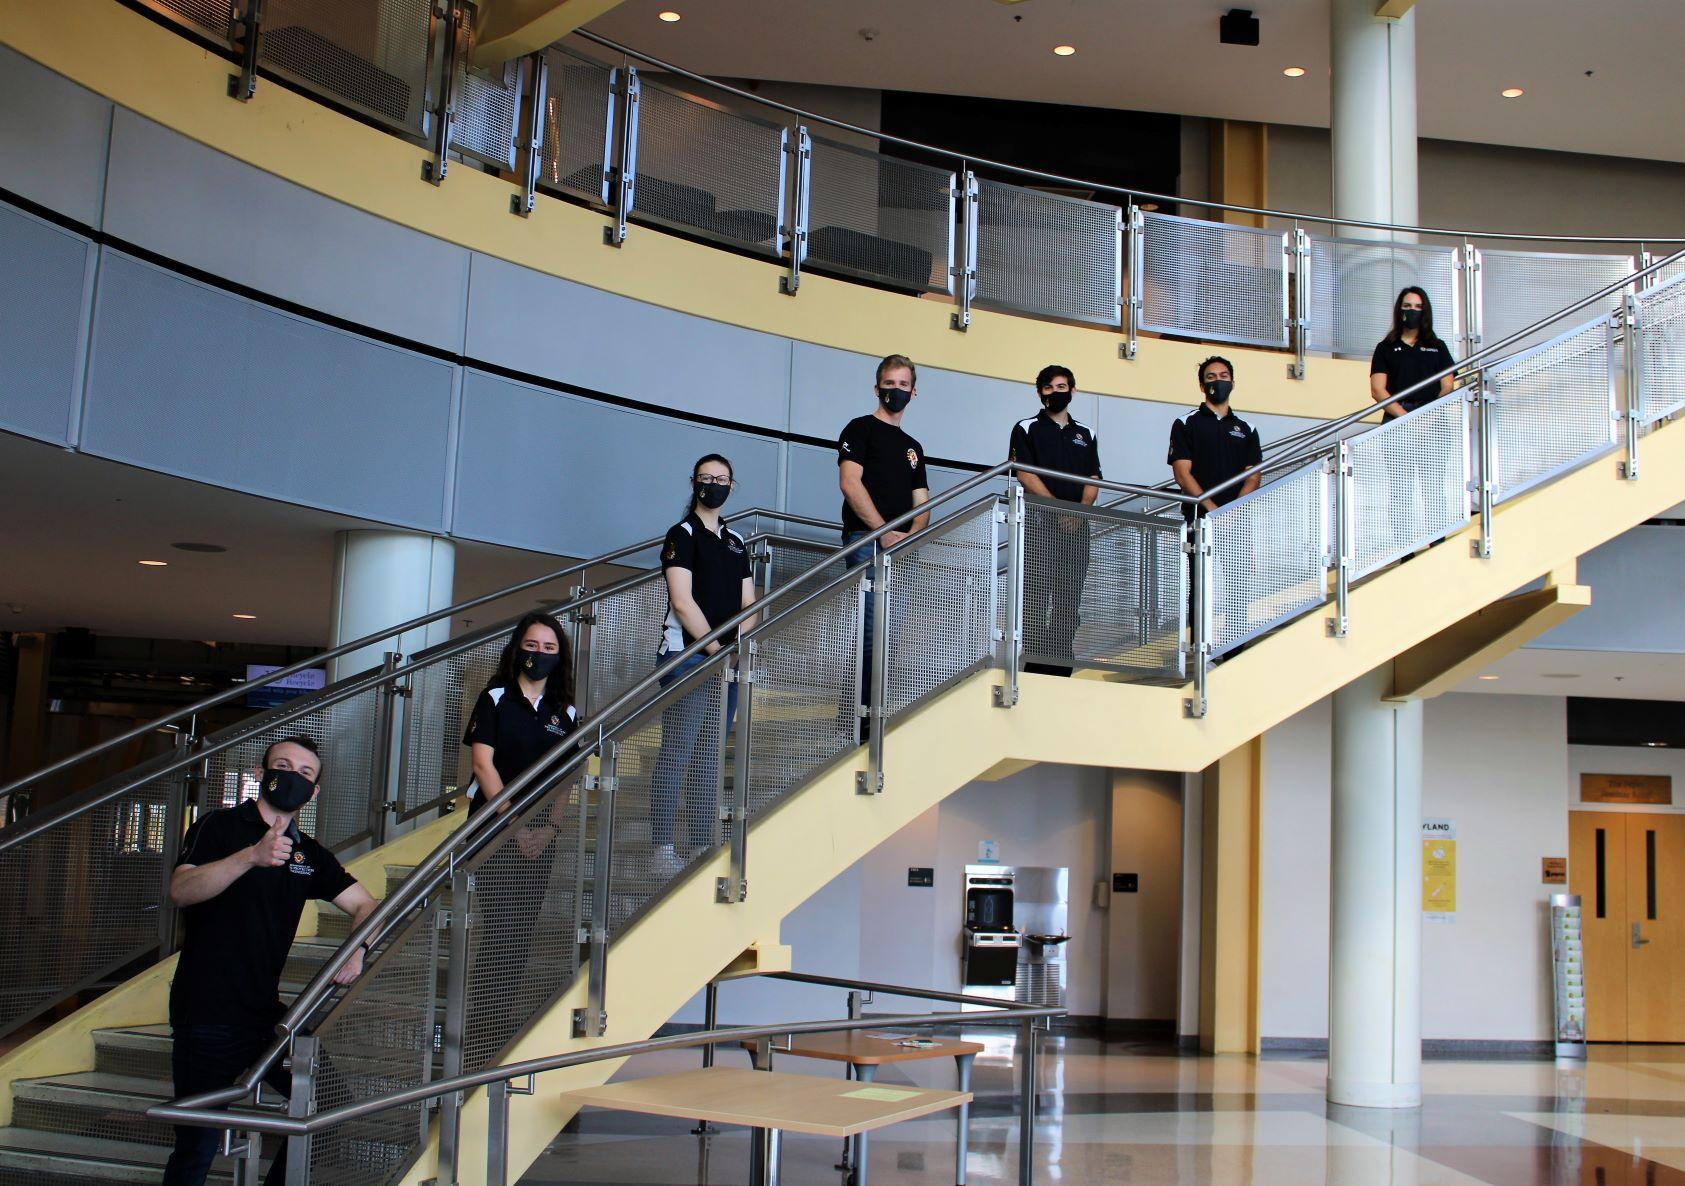 FPE undergrad ambassadors on Kim building staircase